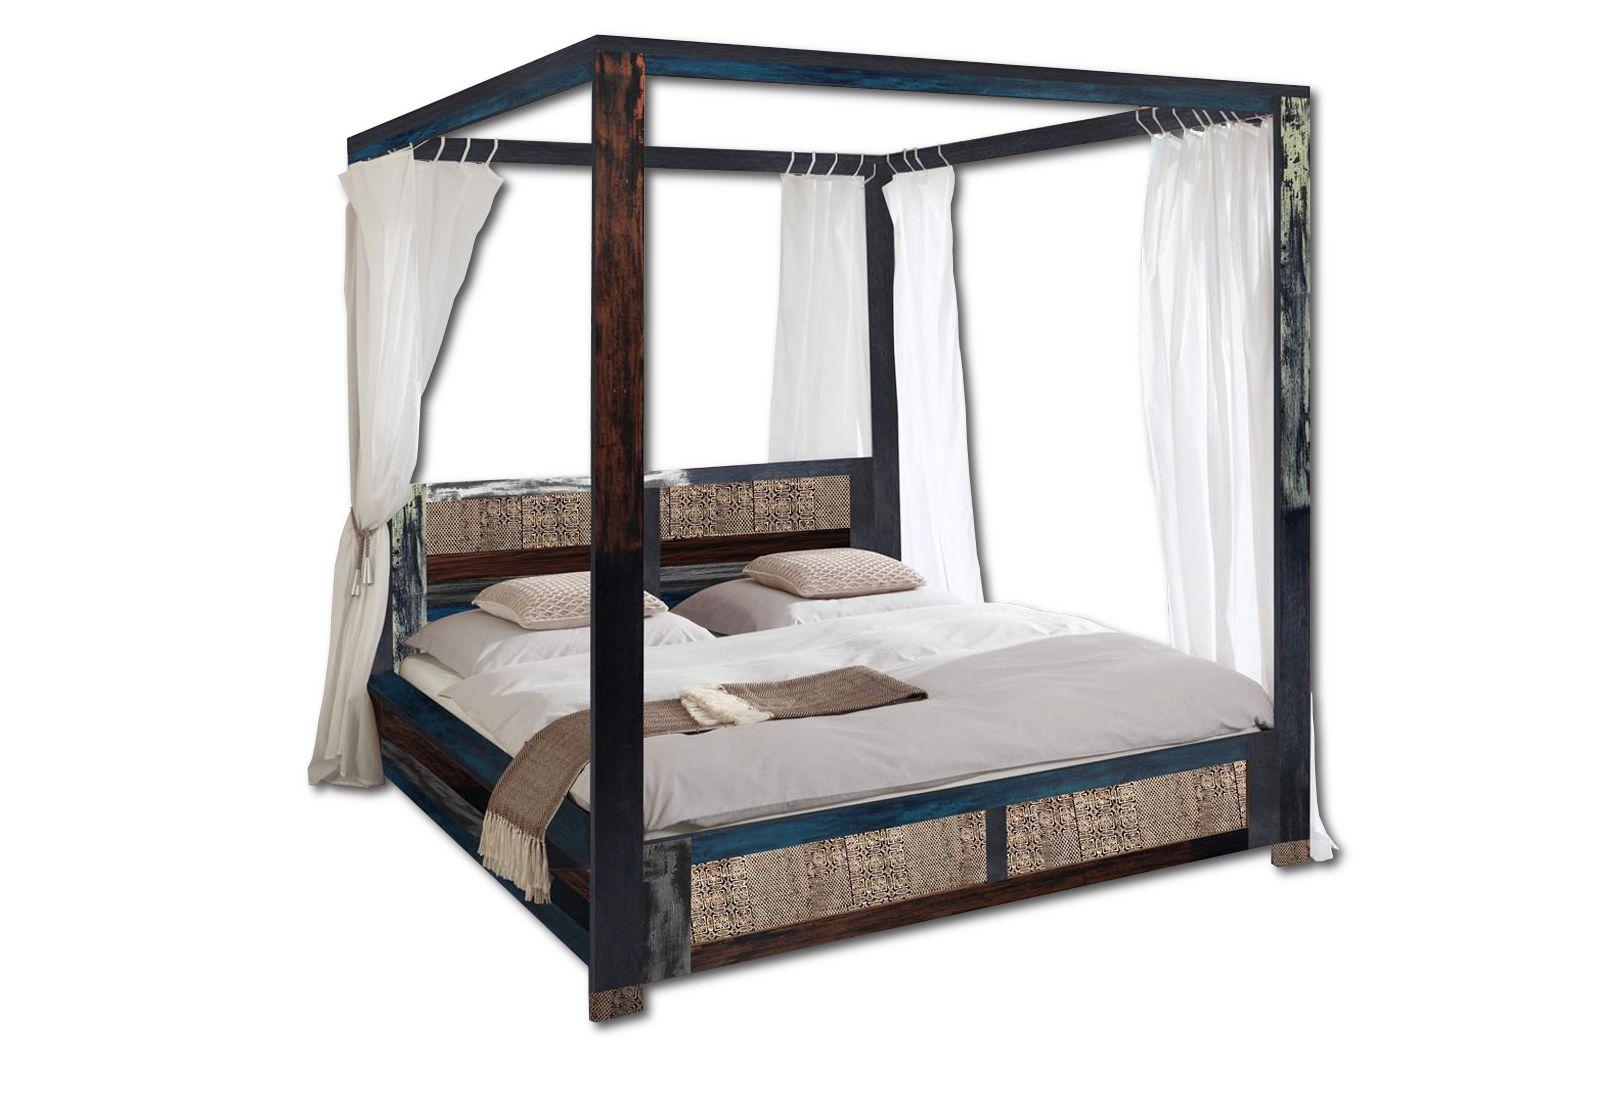 sam vintage himmelbett holzbett metall 160 x 200 cm bunt. Black Bedroom Furniture Sets. Home Design Ideas